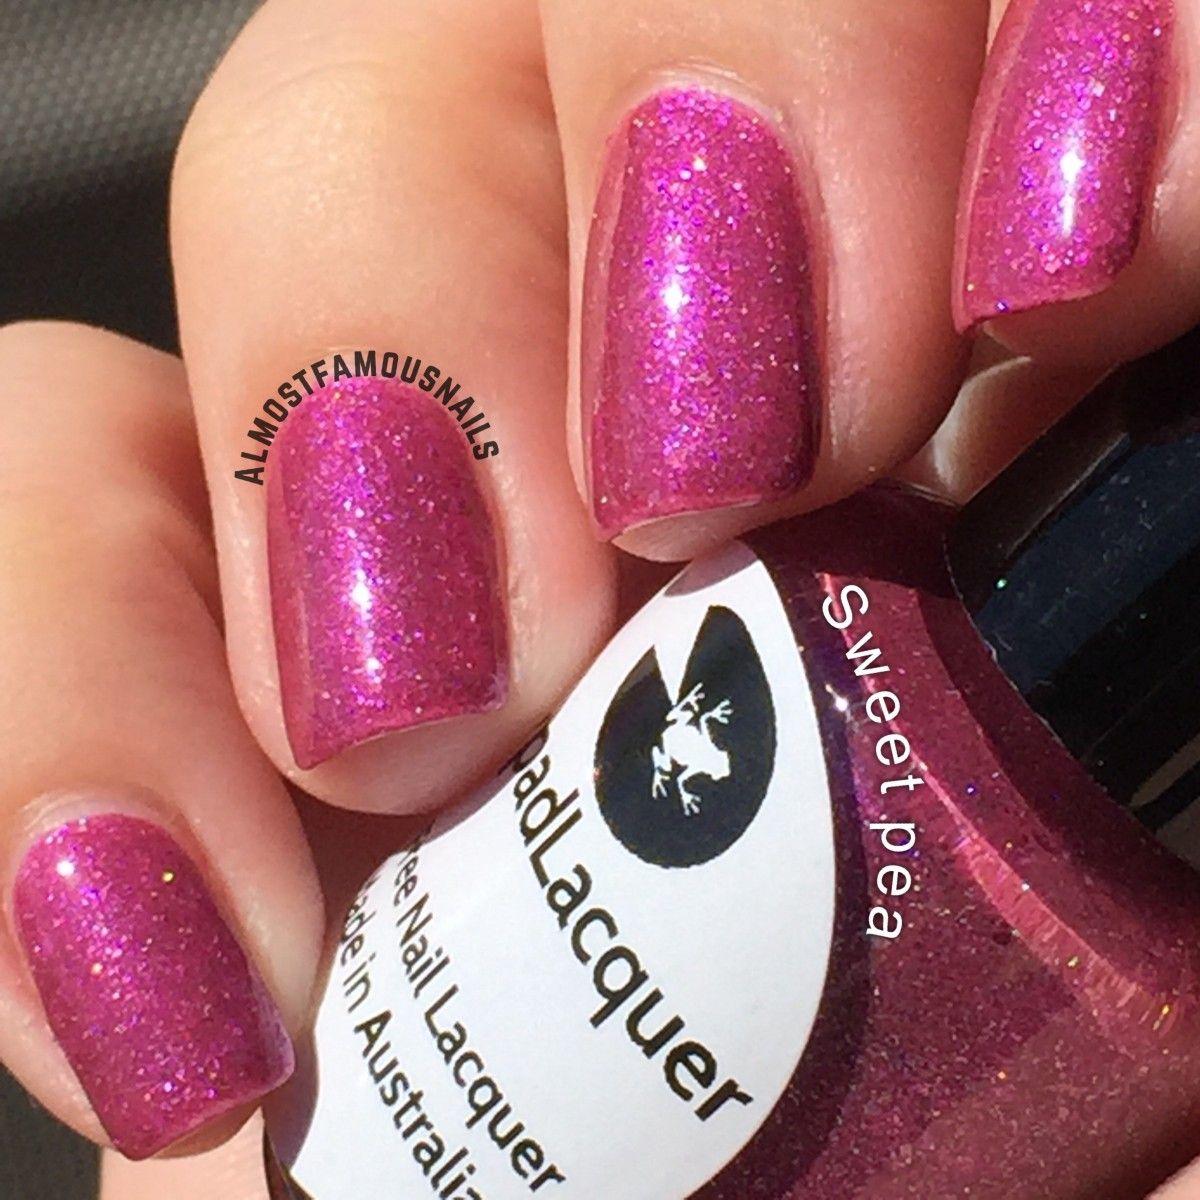 Lilypad Lacquer - Sweetpea LE   Lilypad Stash   Pinterest